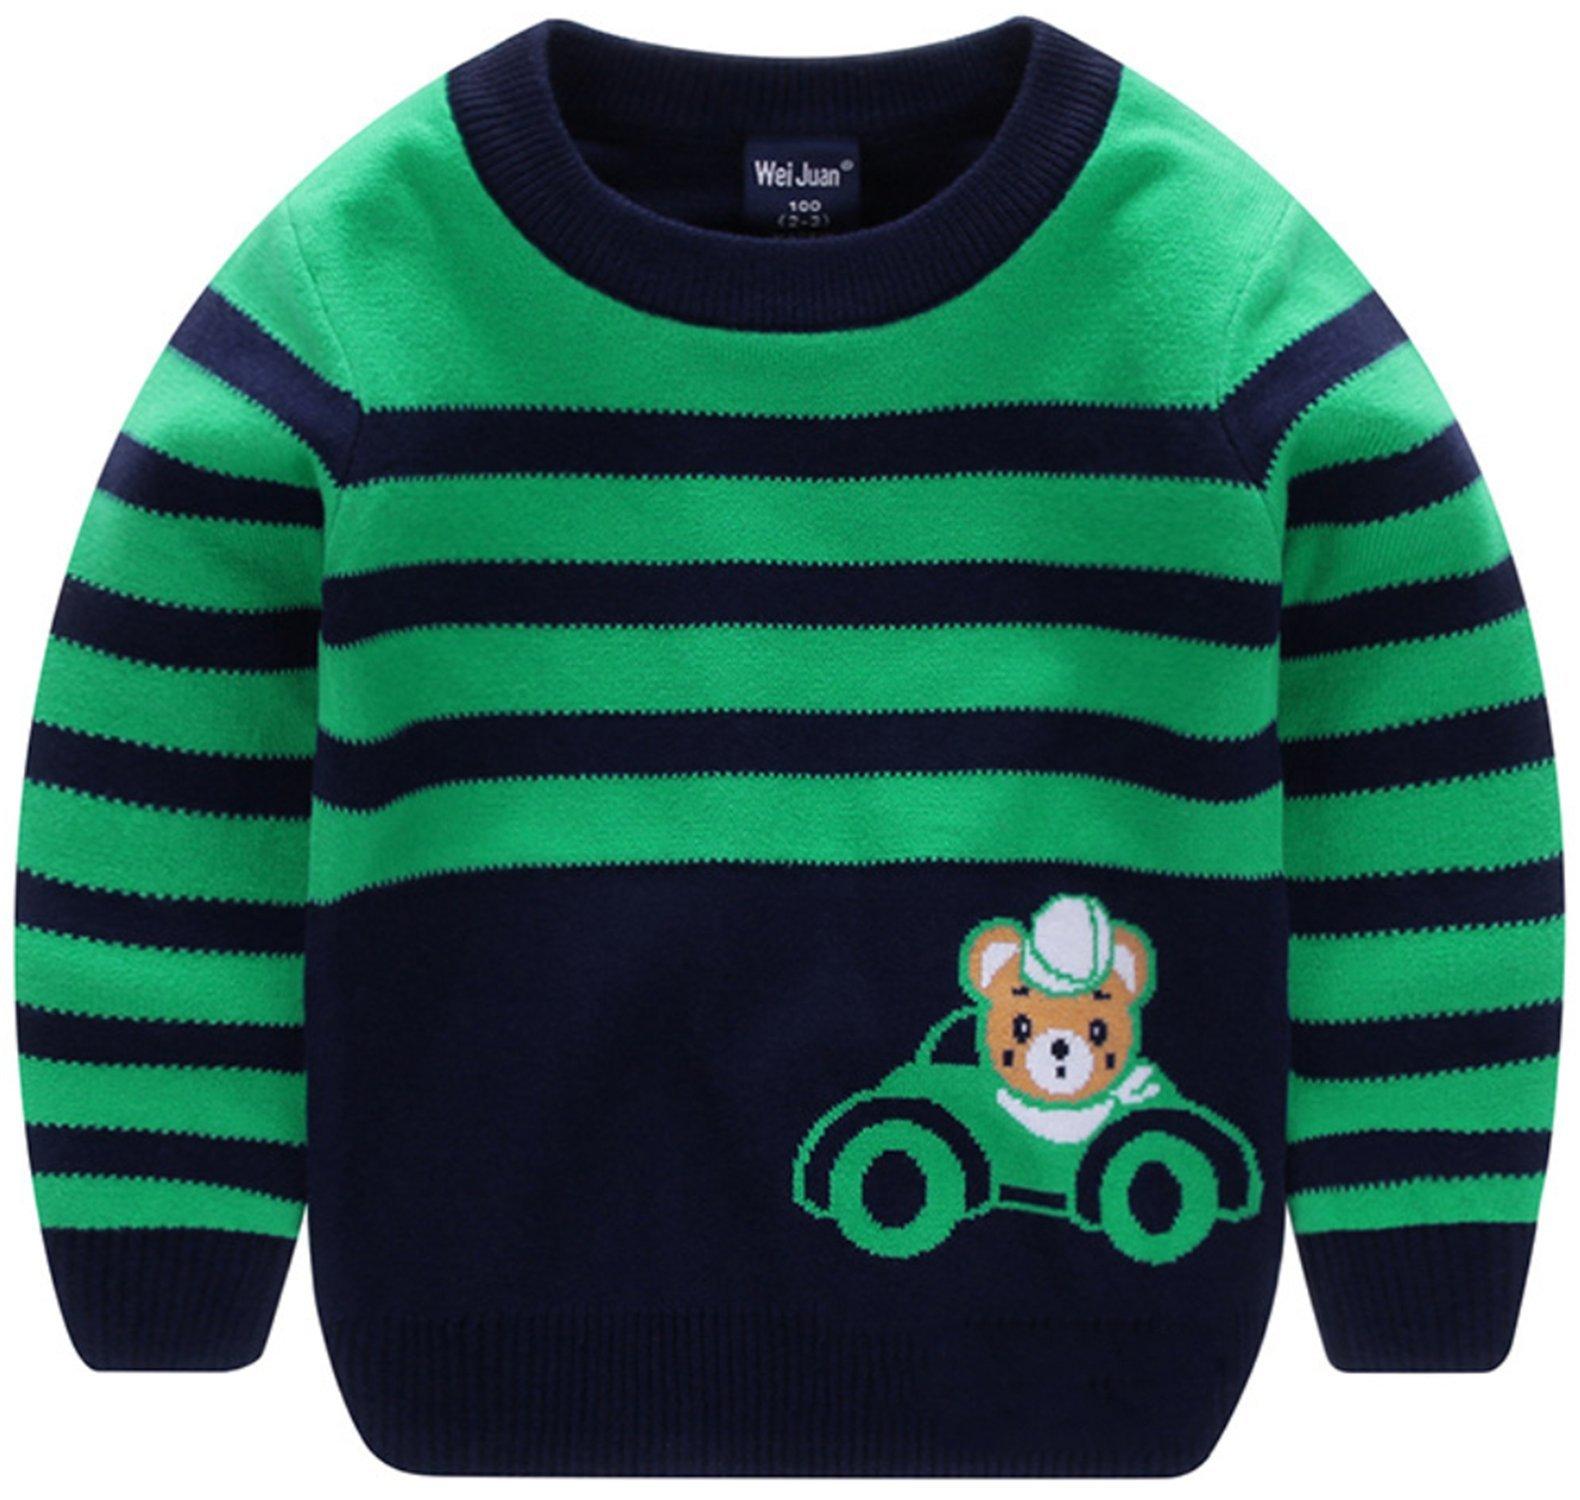 AUIE SAOSA Little Kids Winter double Cotton knit Cartoon Bear warm pullover Sweater Green GN130